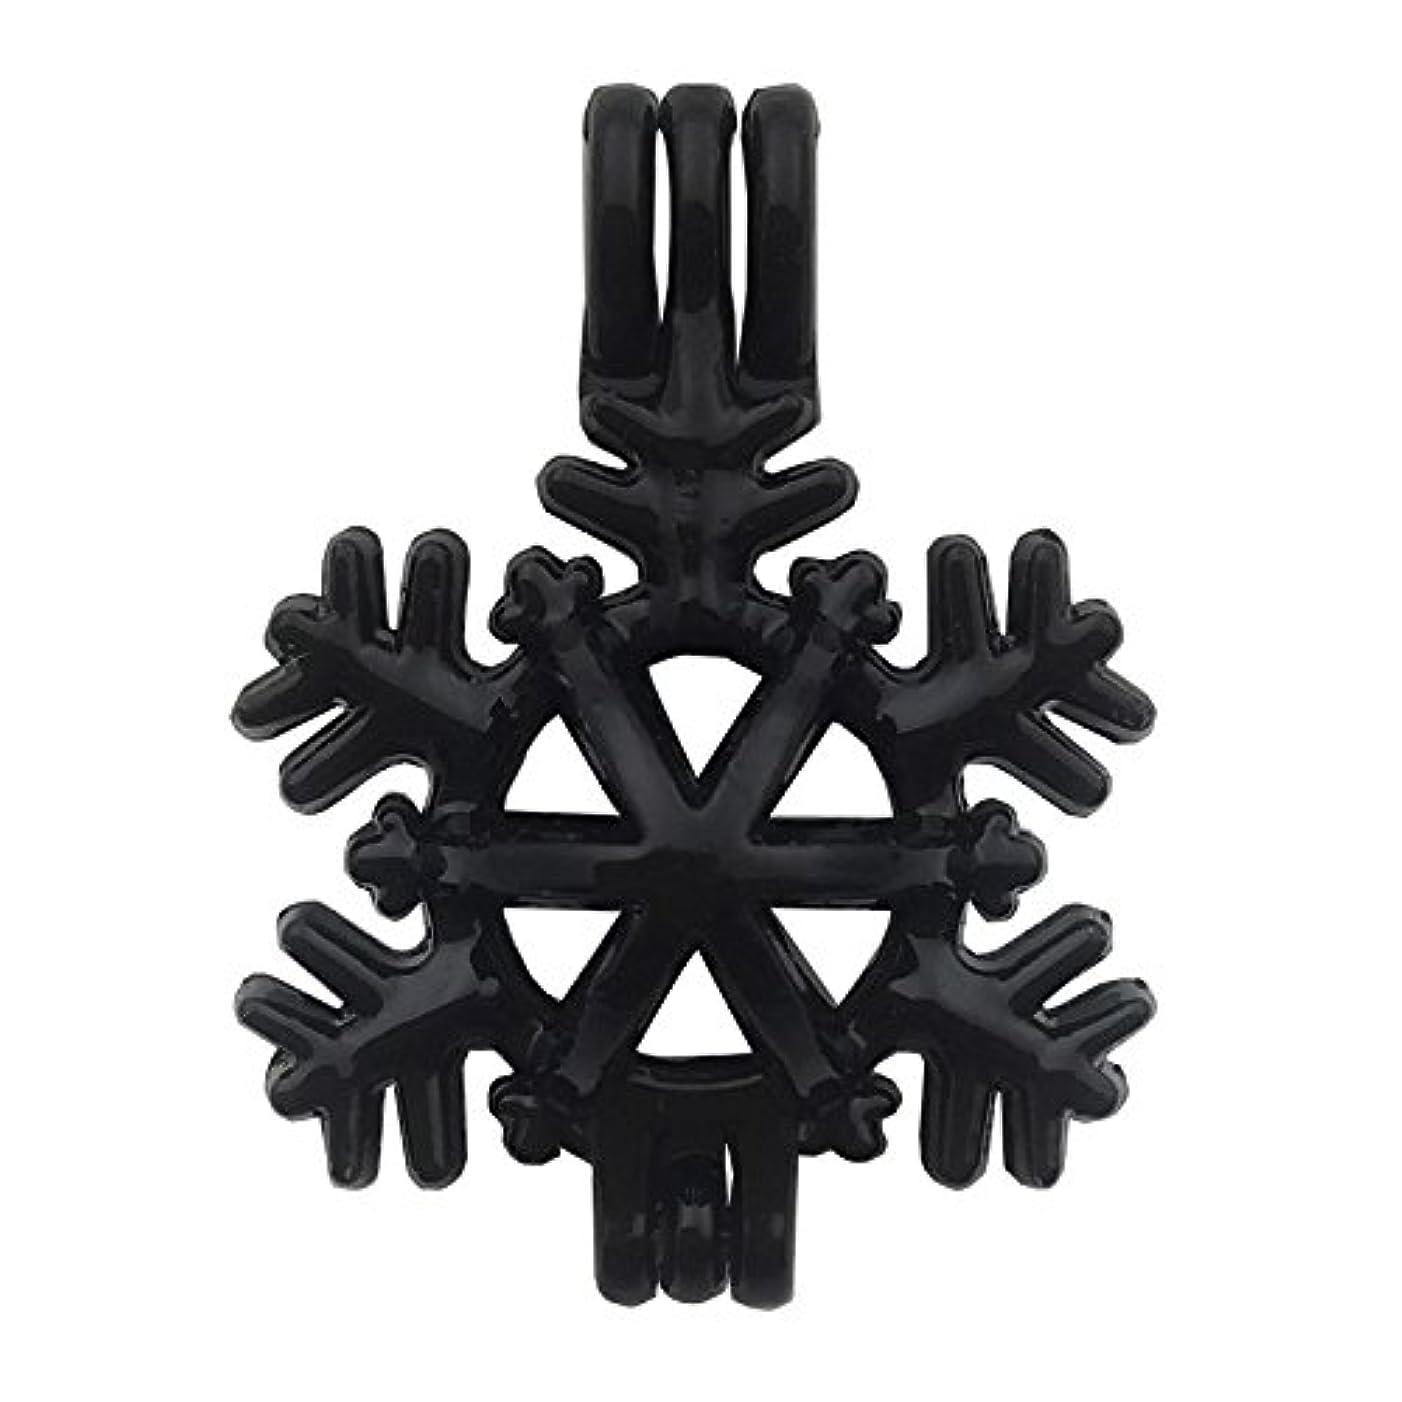 10pcs Enamel Black Pearl Bead Cage Pendant Perfume Essential Oil Aromatherapy Diffuser Locket Charm Pendant Craft Jewelry Making Necklace Bracelet DIY M50 (Snowflake)